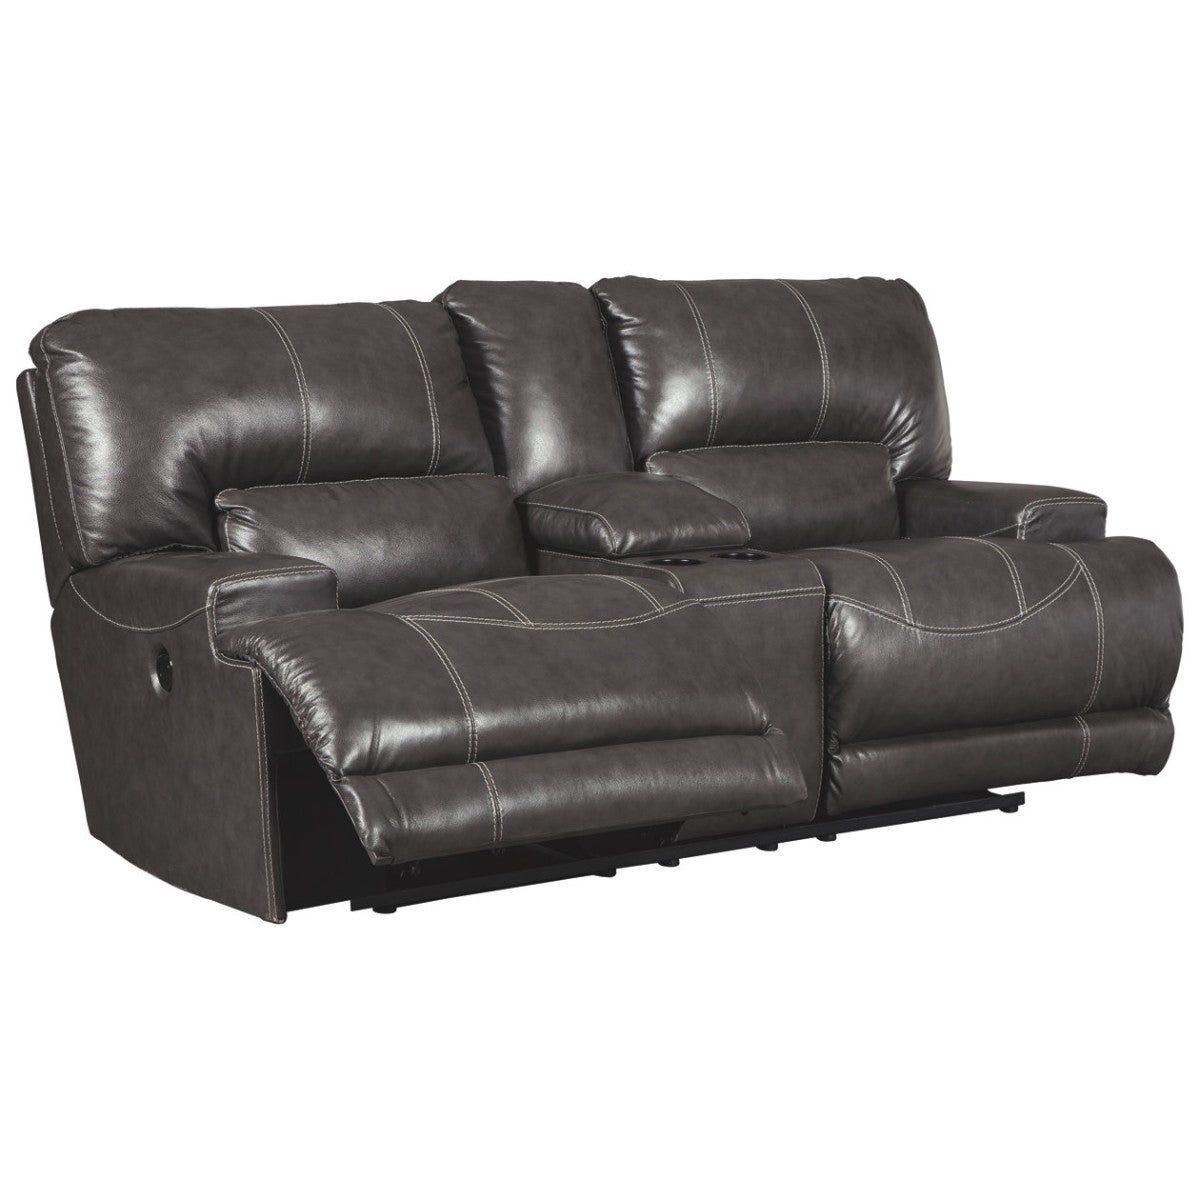 Stupendous Leatherette Upholstered Metal Power Reclining Loveseat With Frankydiablos Diy Chair Ideas Frankydiabloscom